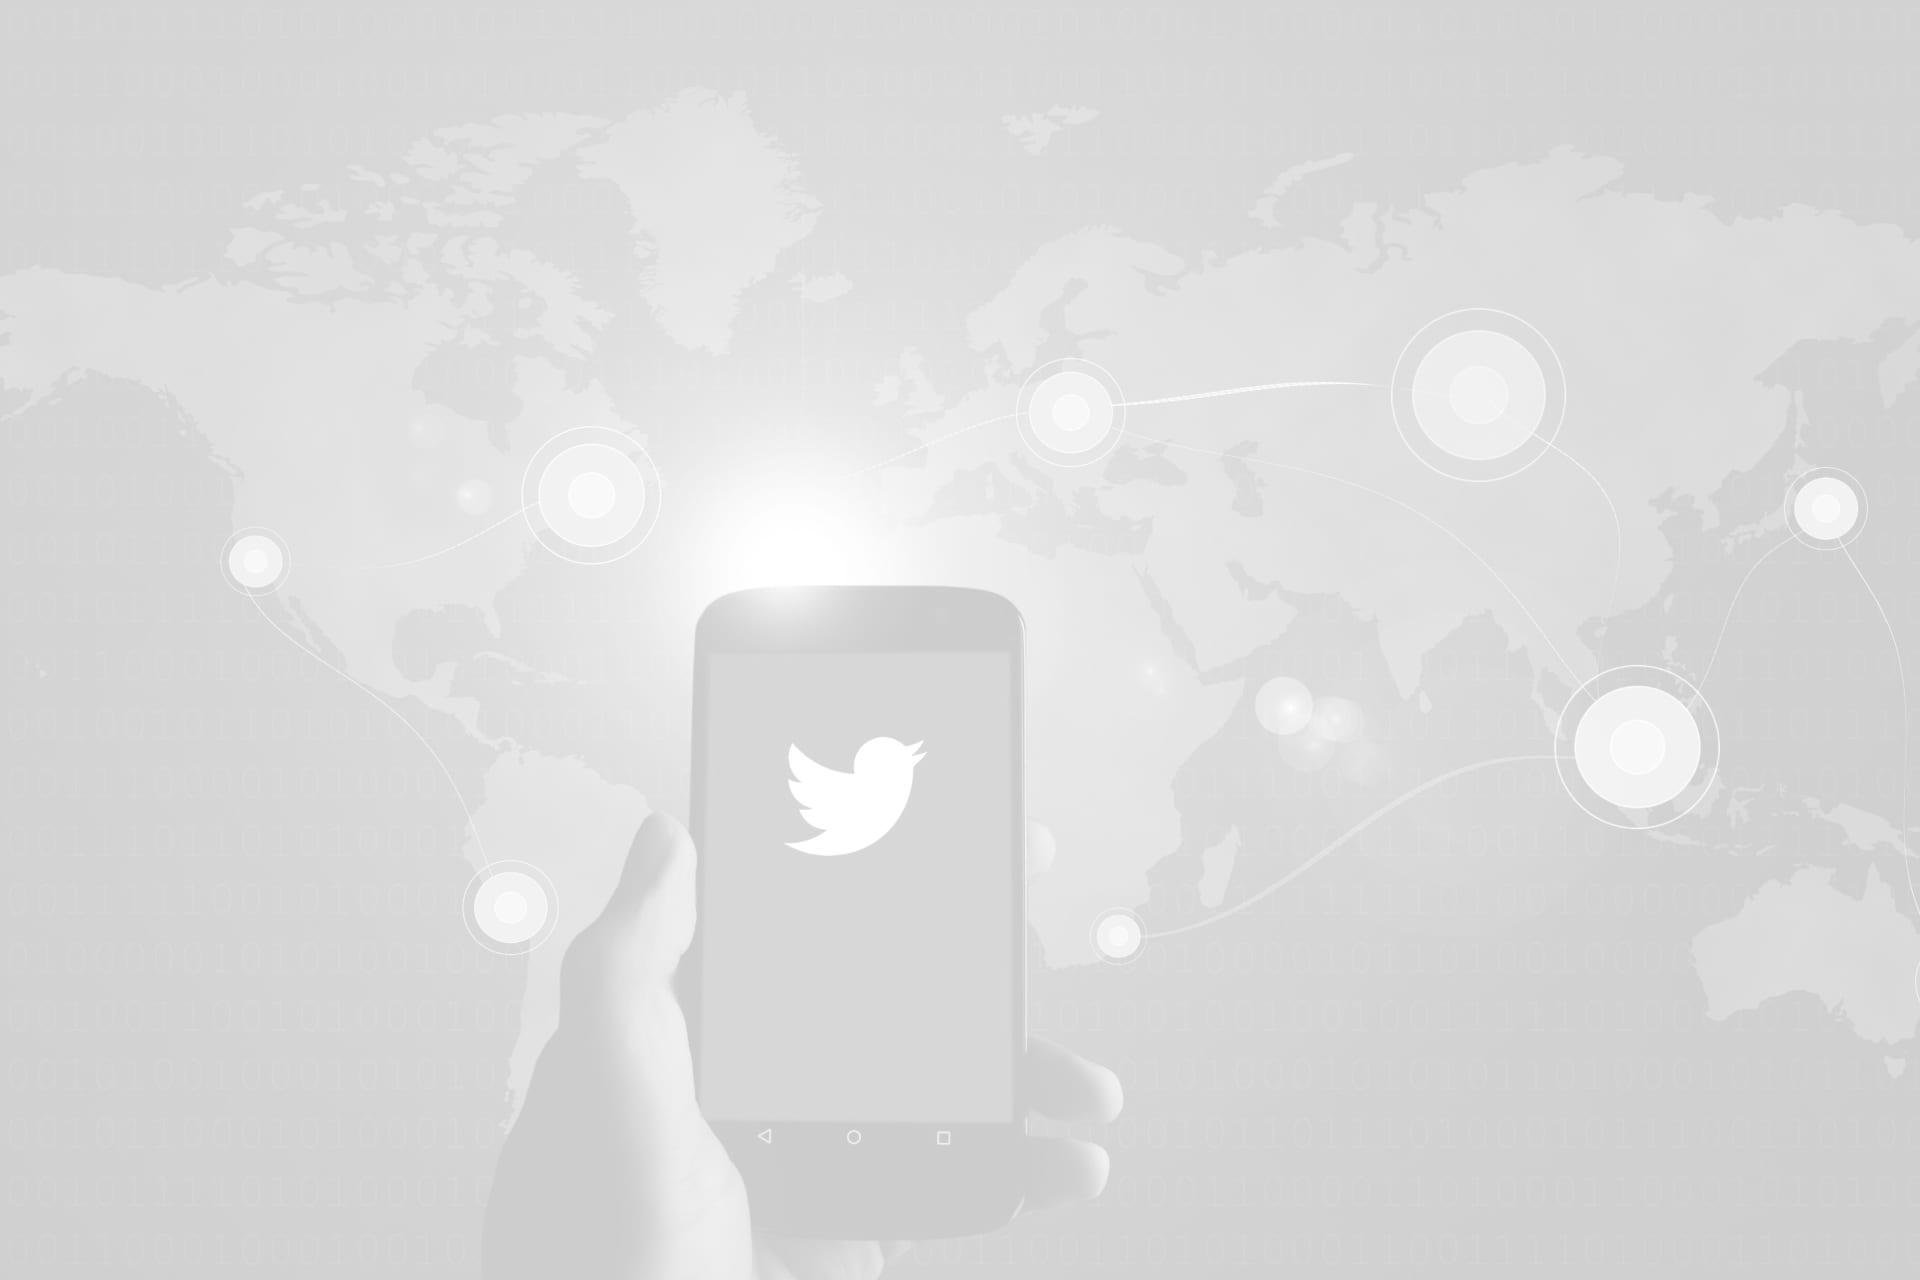 blog en twitter para negocios